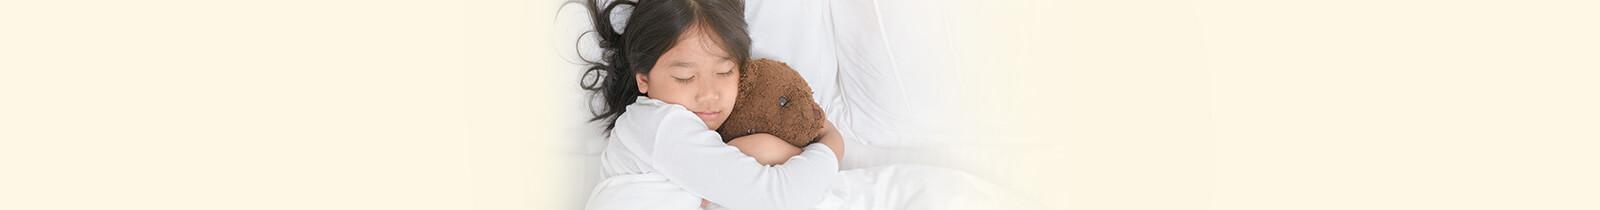 Sleep Guide for Kids